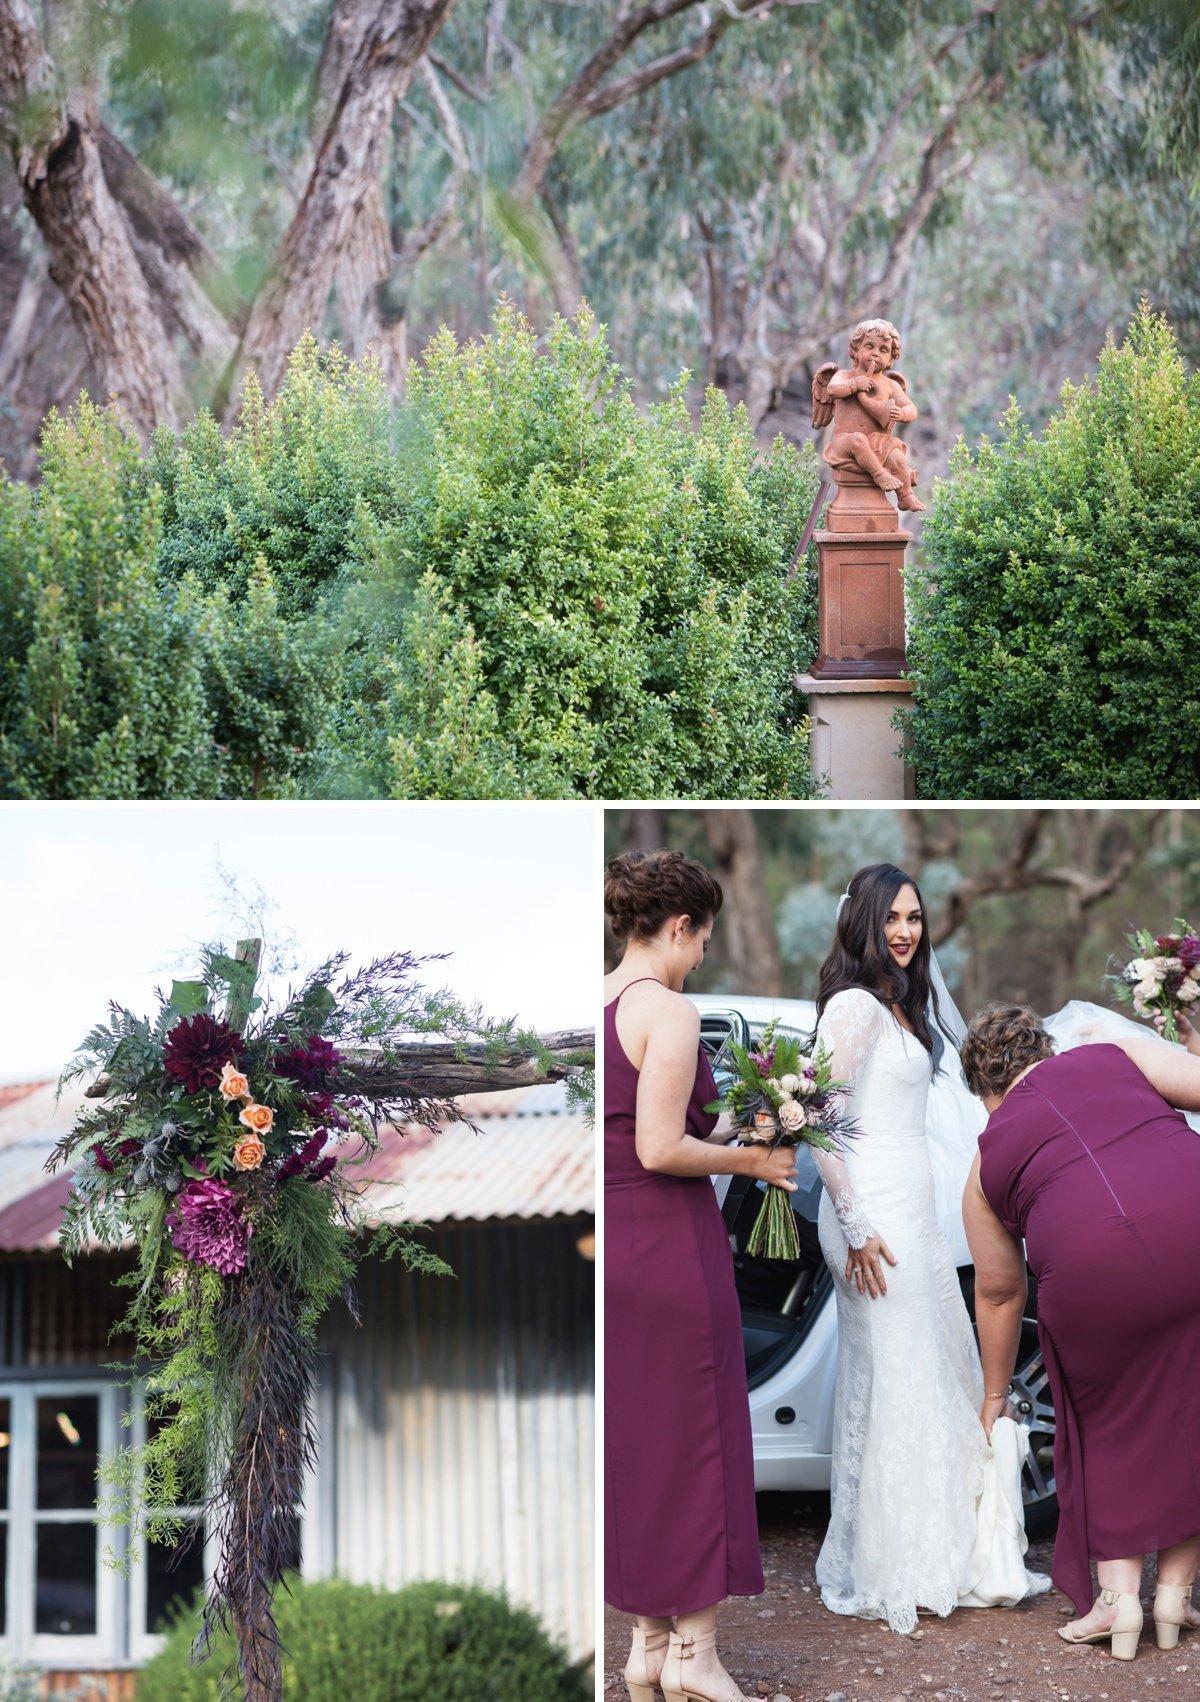 tabletop mountain peregrines wedding albury wagga wagga_wedding photographer albury griffith melbourne rutherglen wedding photographer_0273